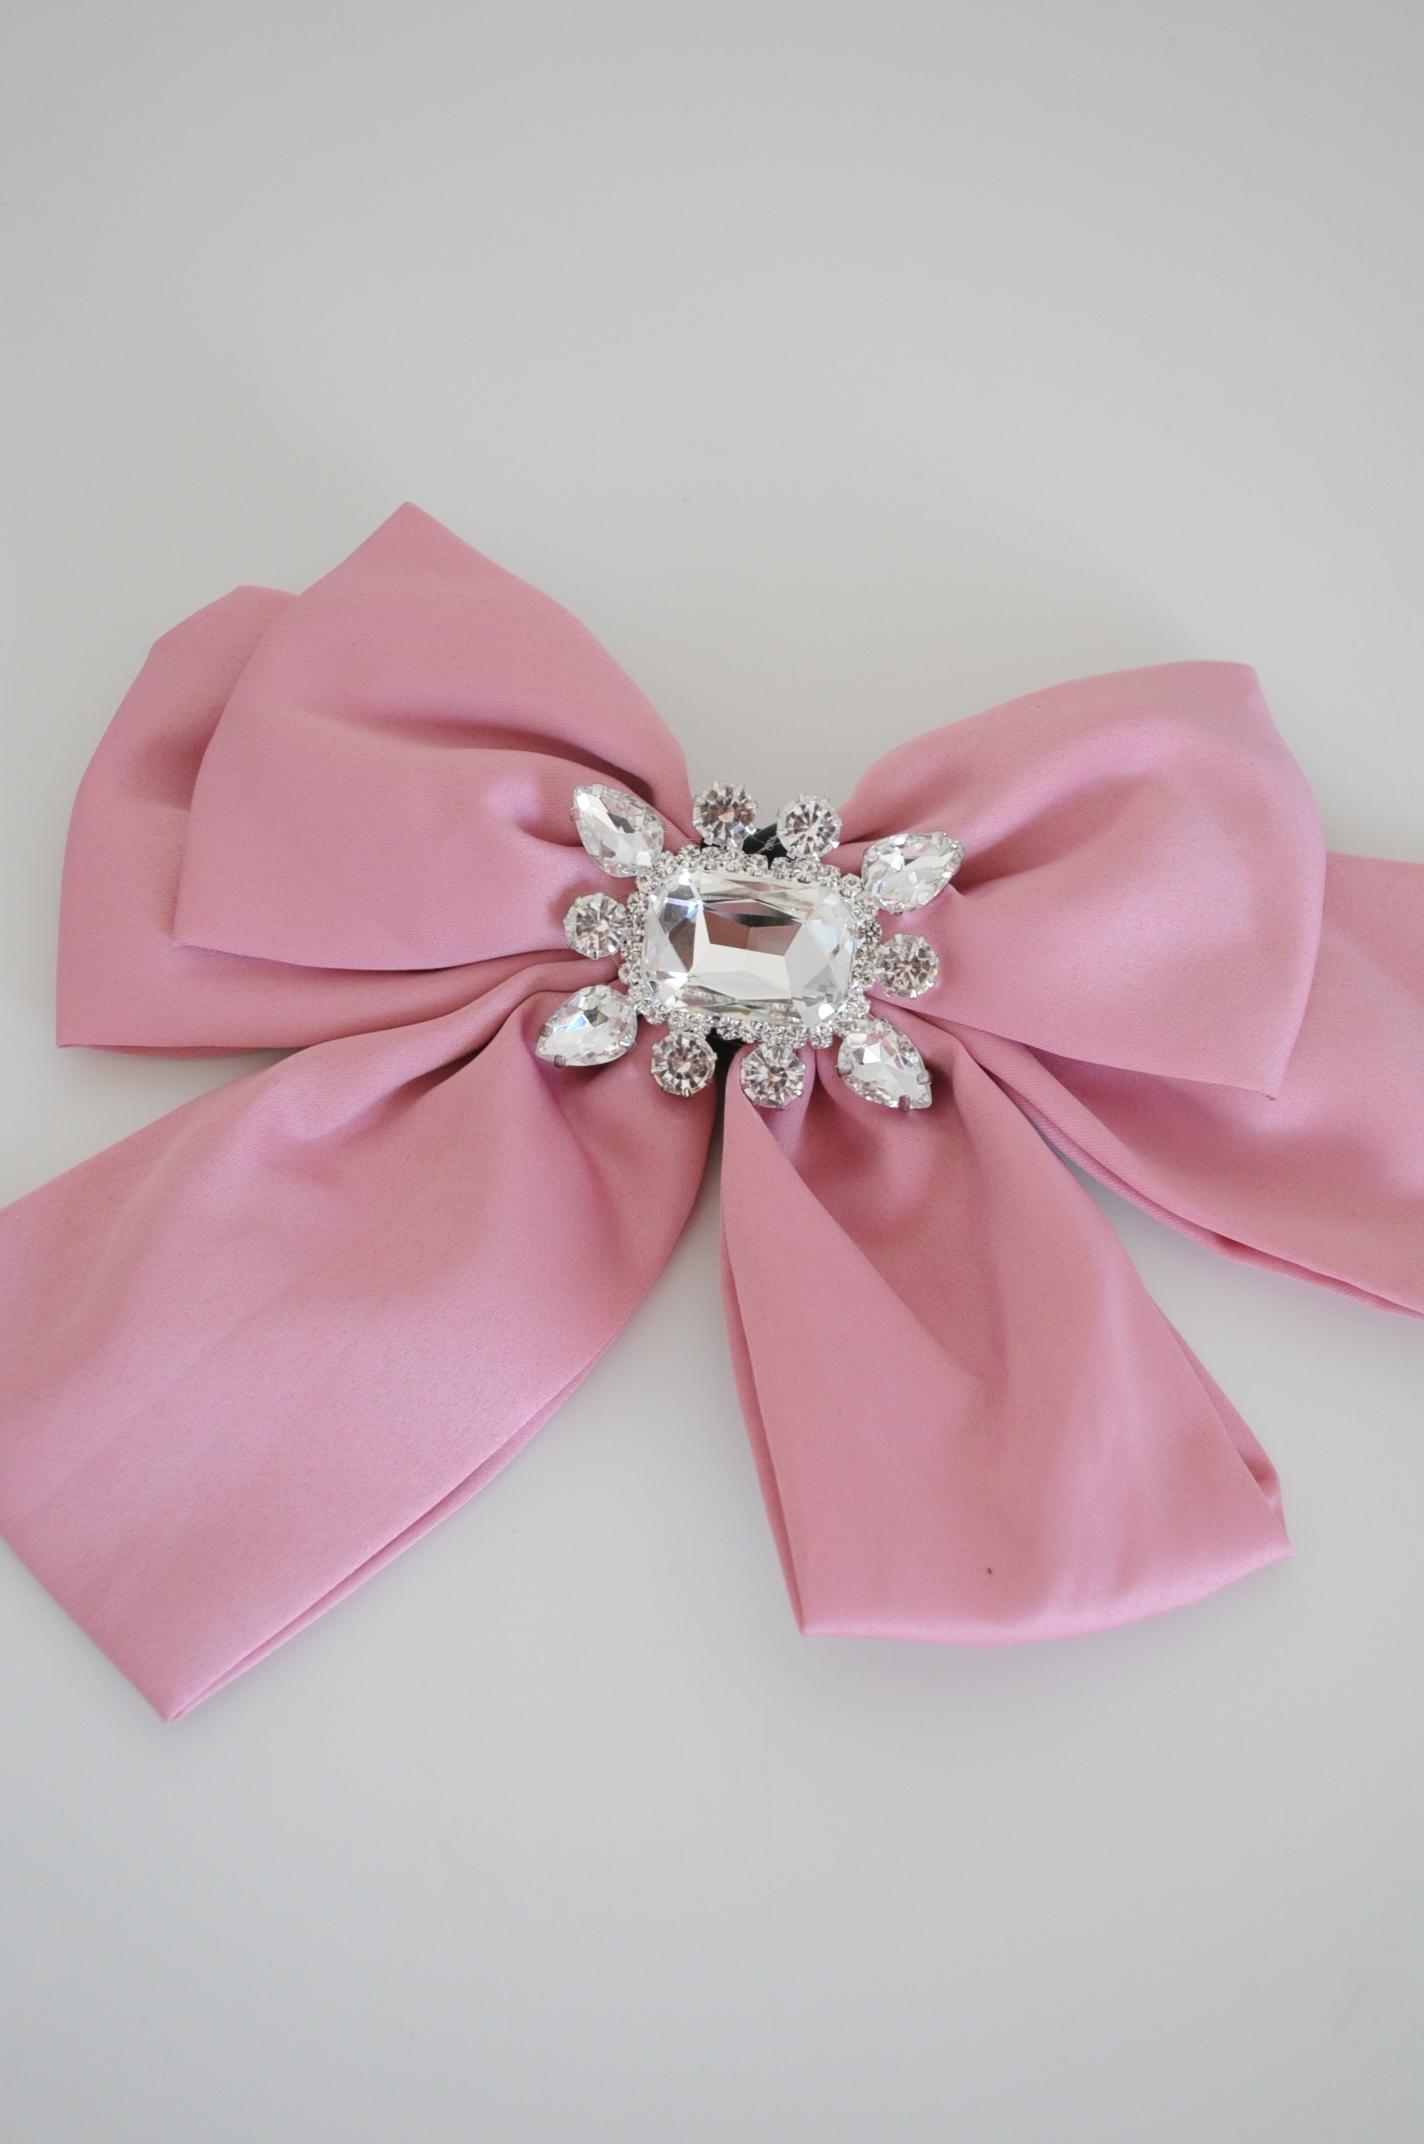 Brosa funda mare roz cu pietre argintii